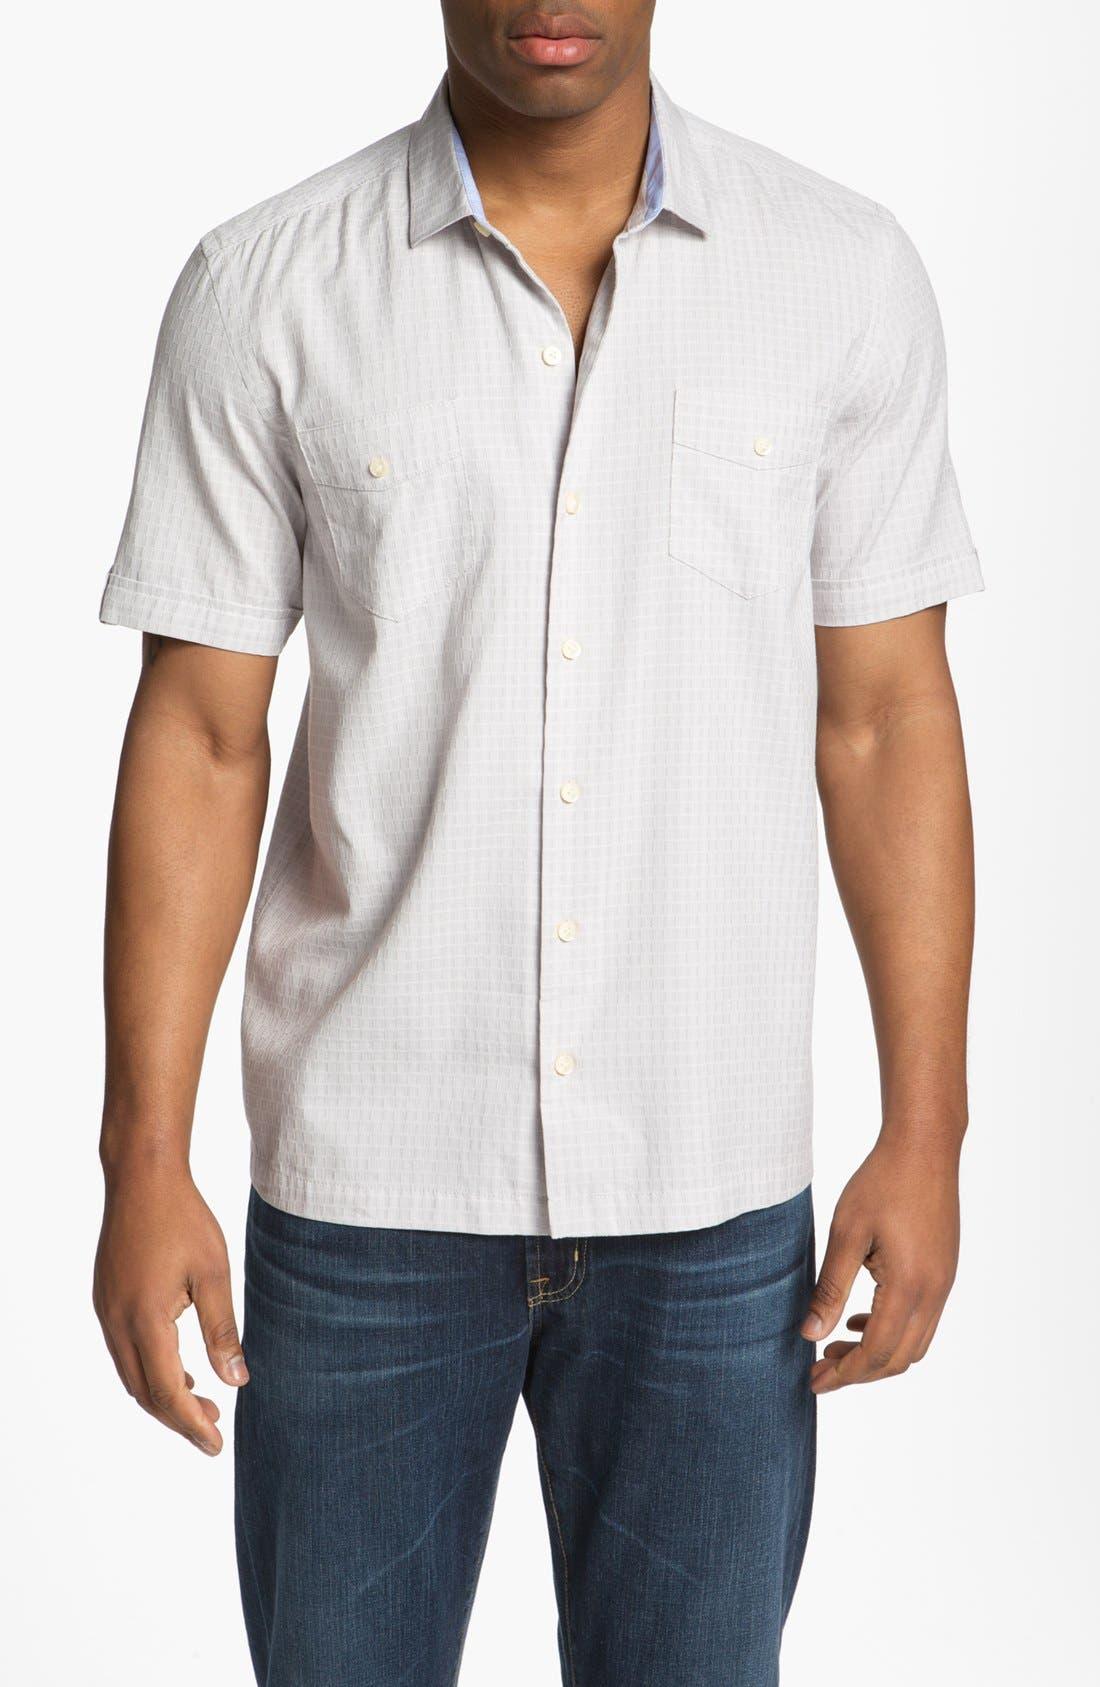 Main Image - Tommy Bahama 'Sound Wave' Silk Blend Campshirt